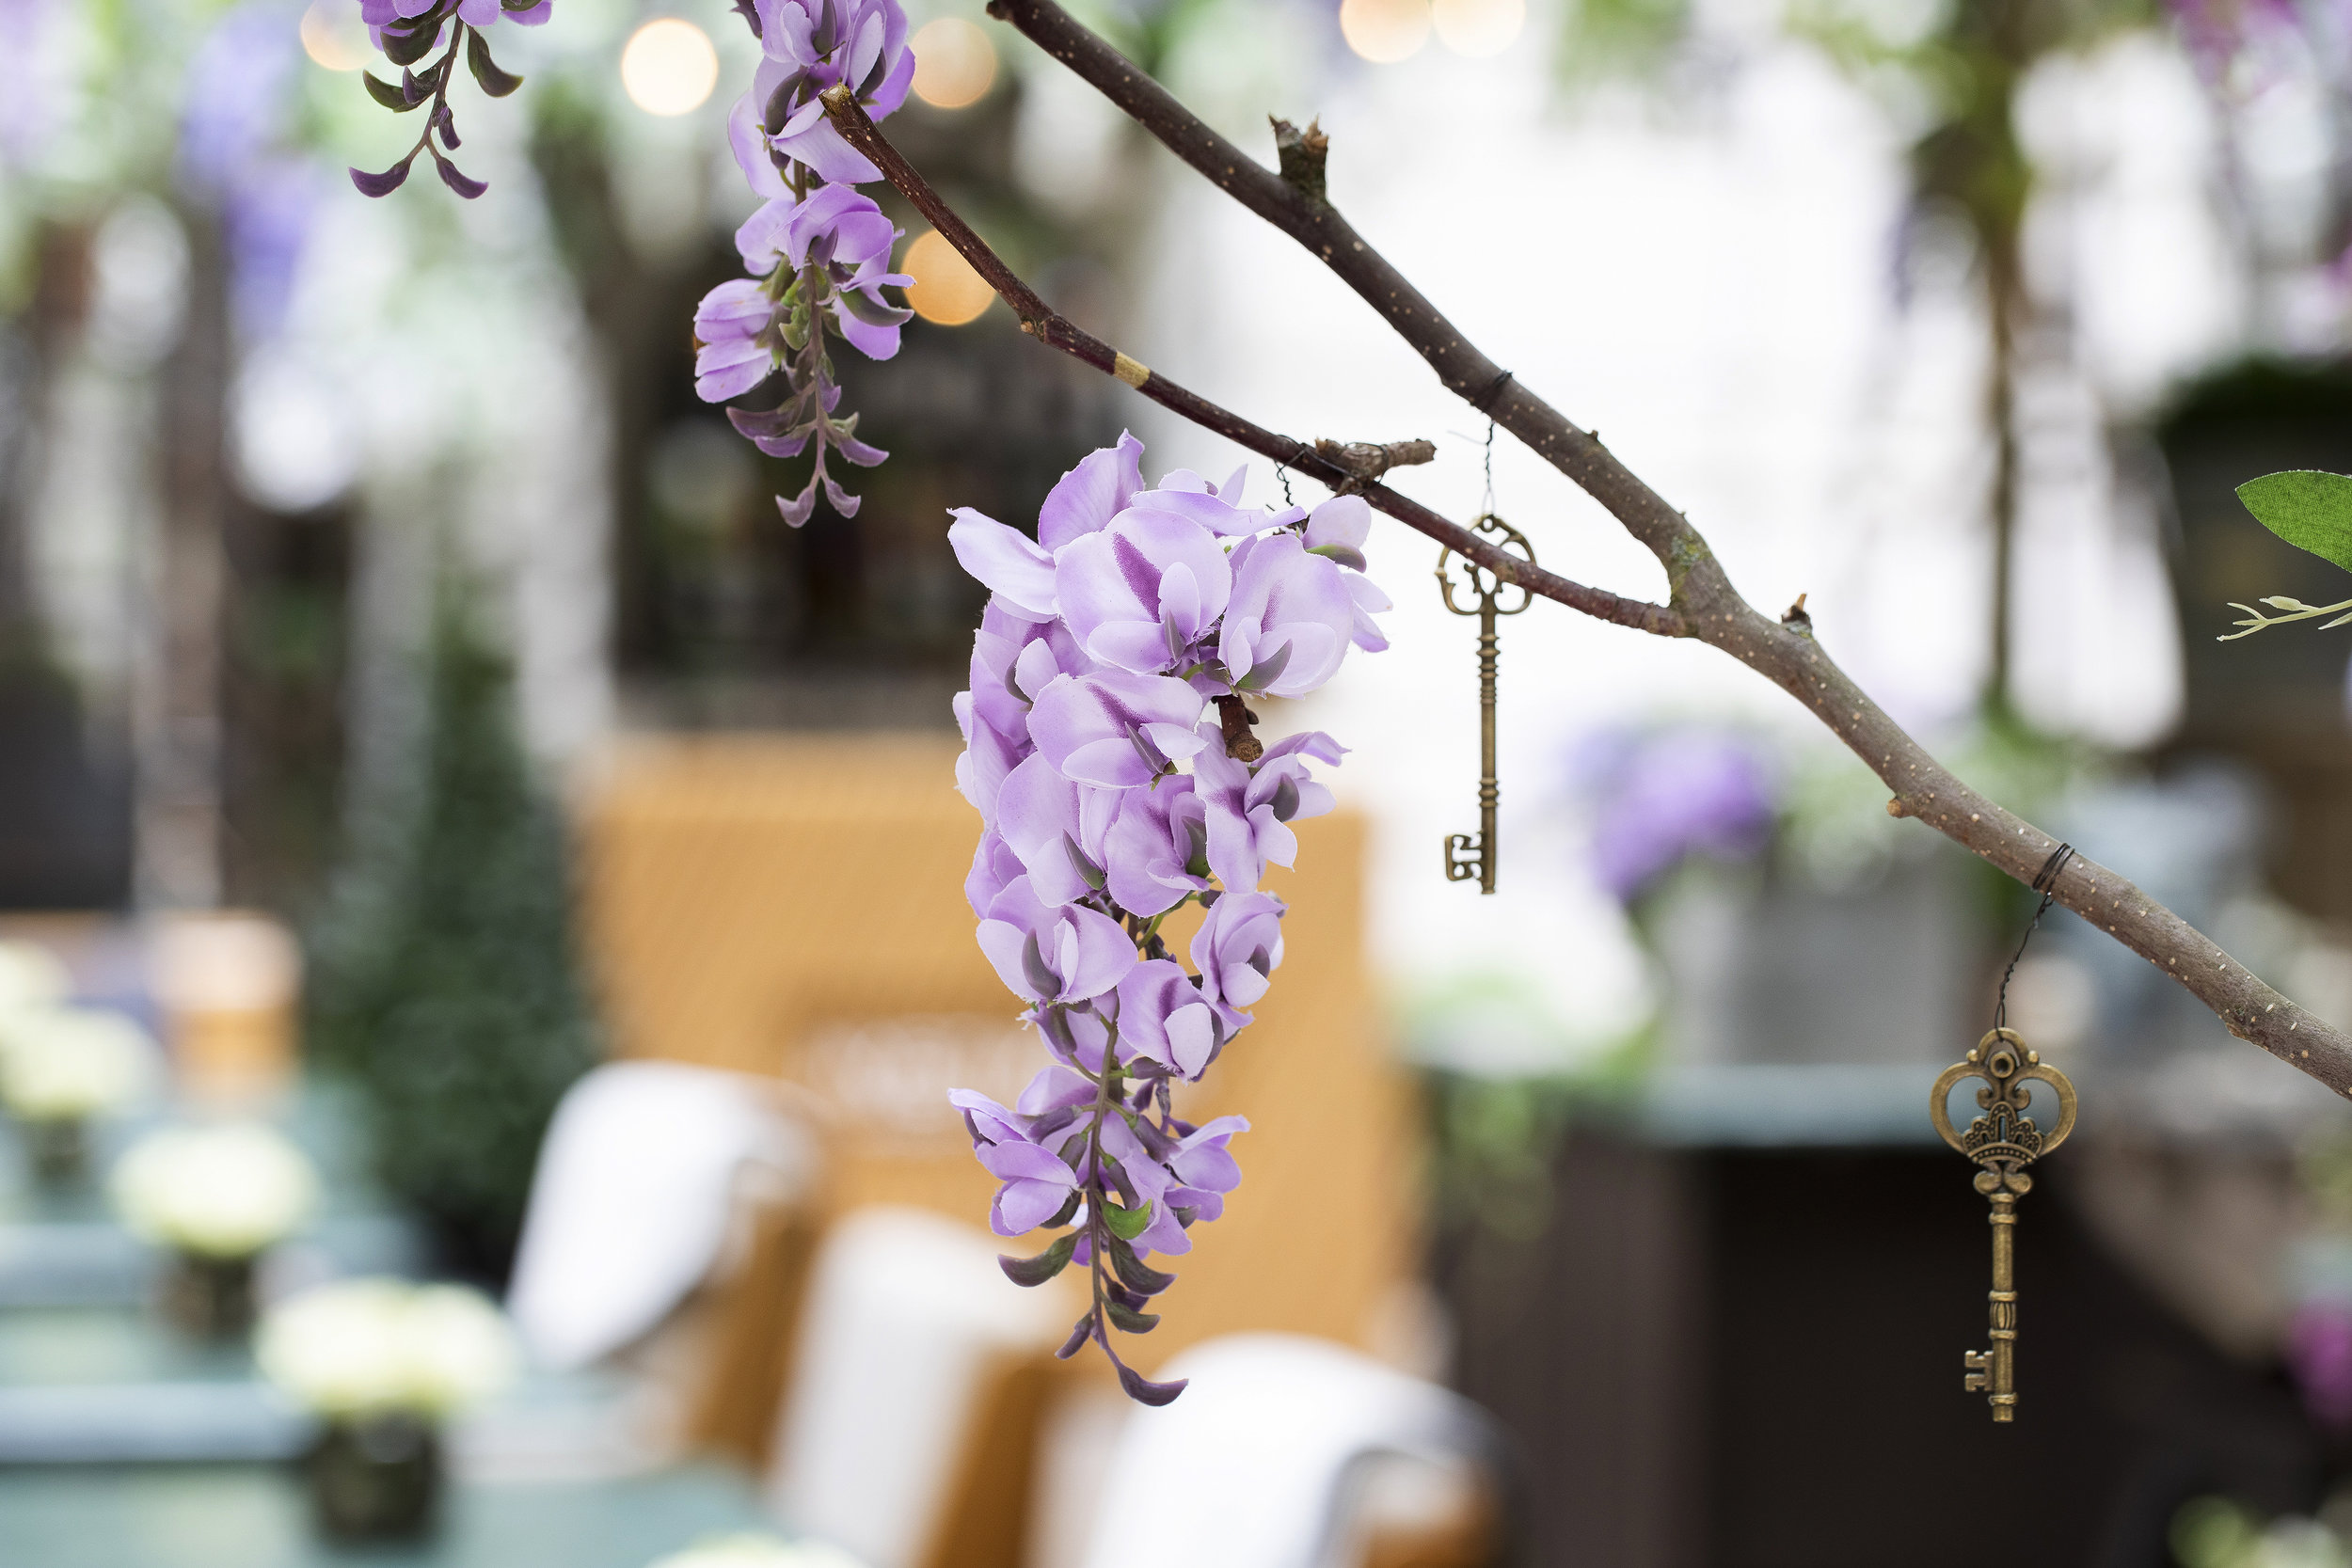 Holborn Dining Room_The Nyetimber Secret Garden__Key_©John Carey (2).jpg